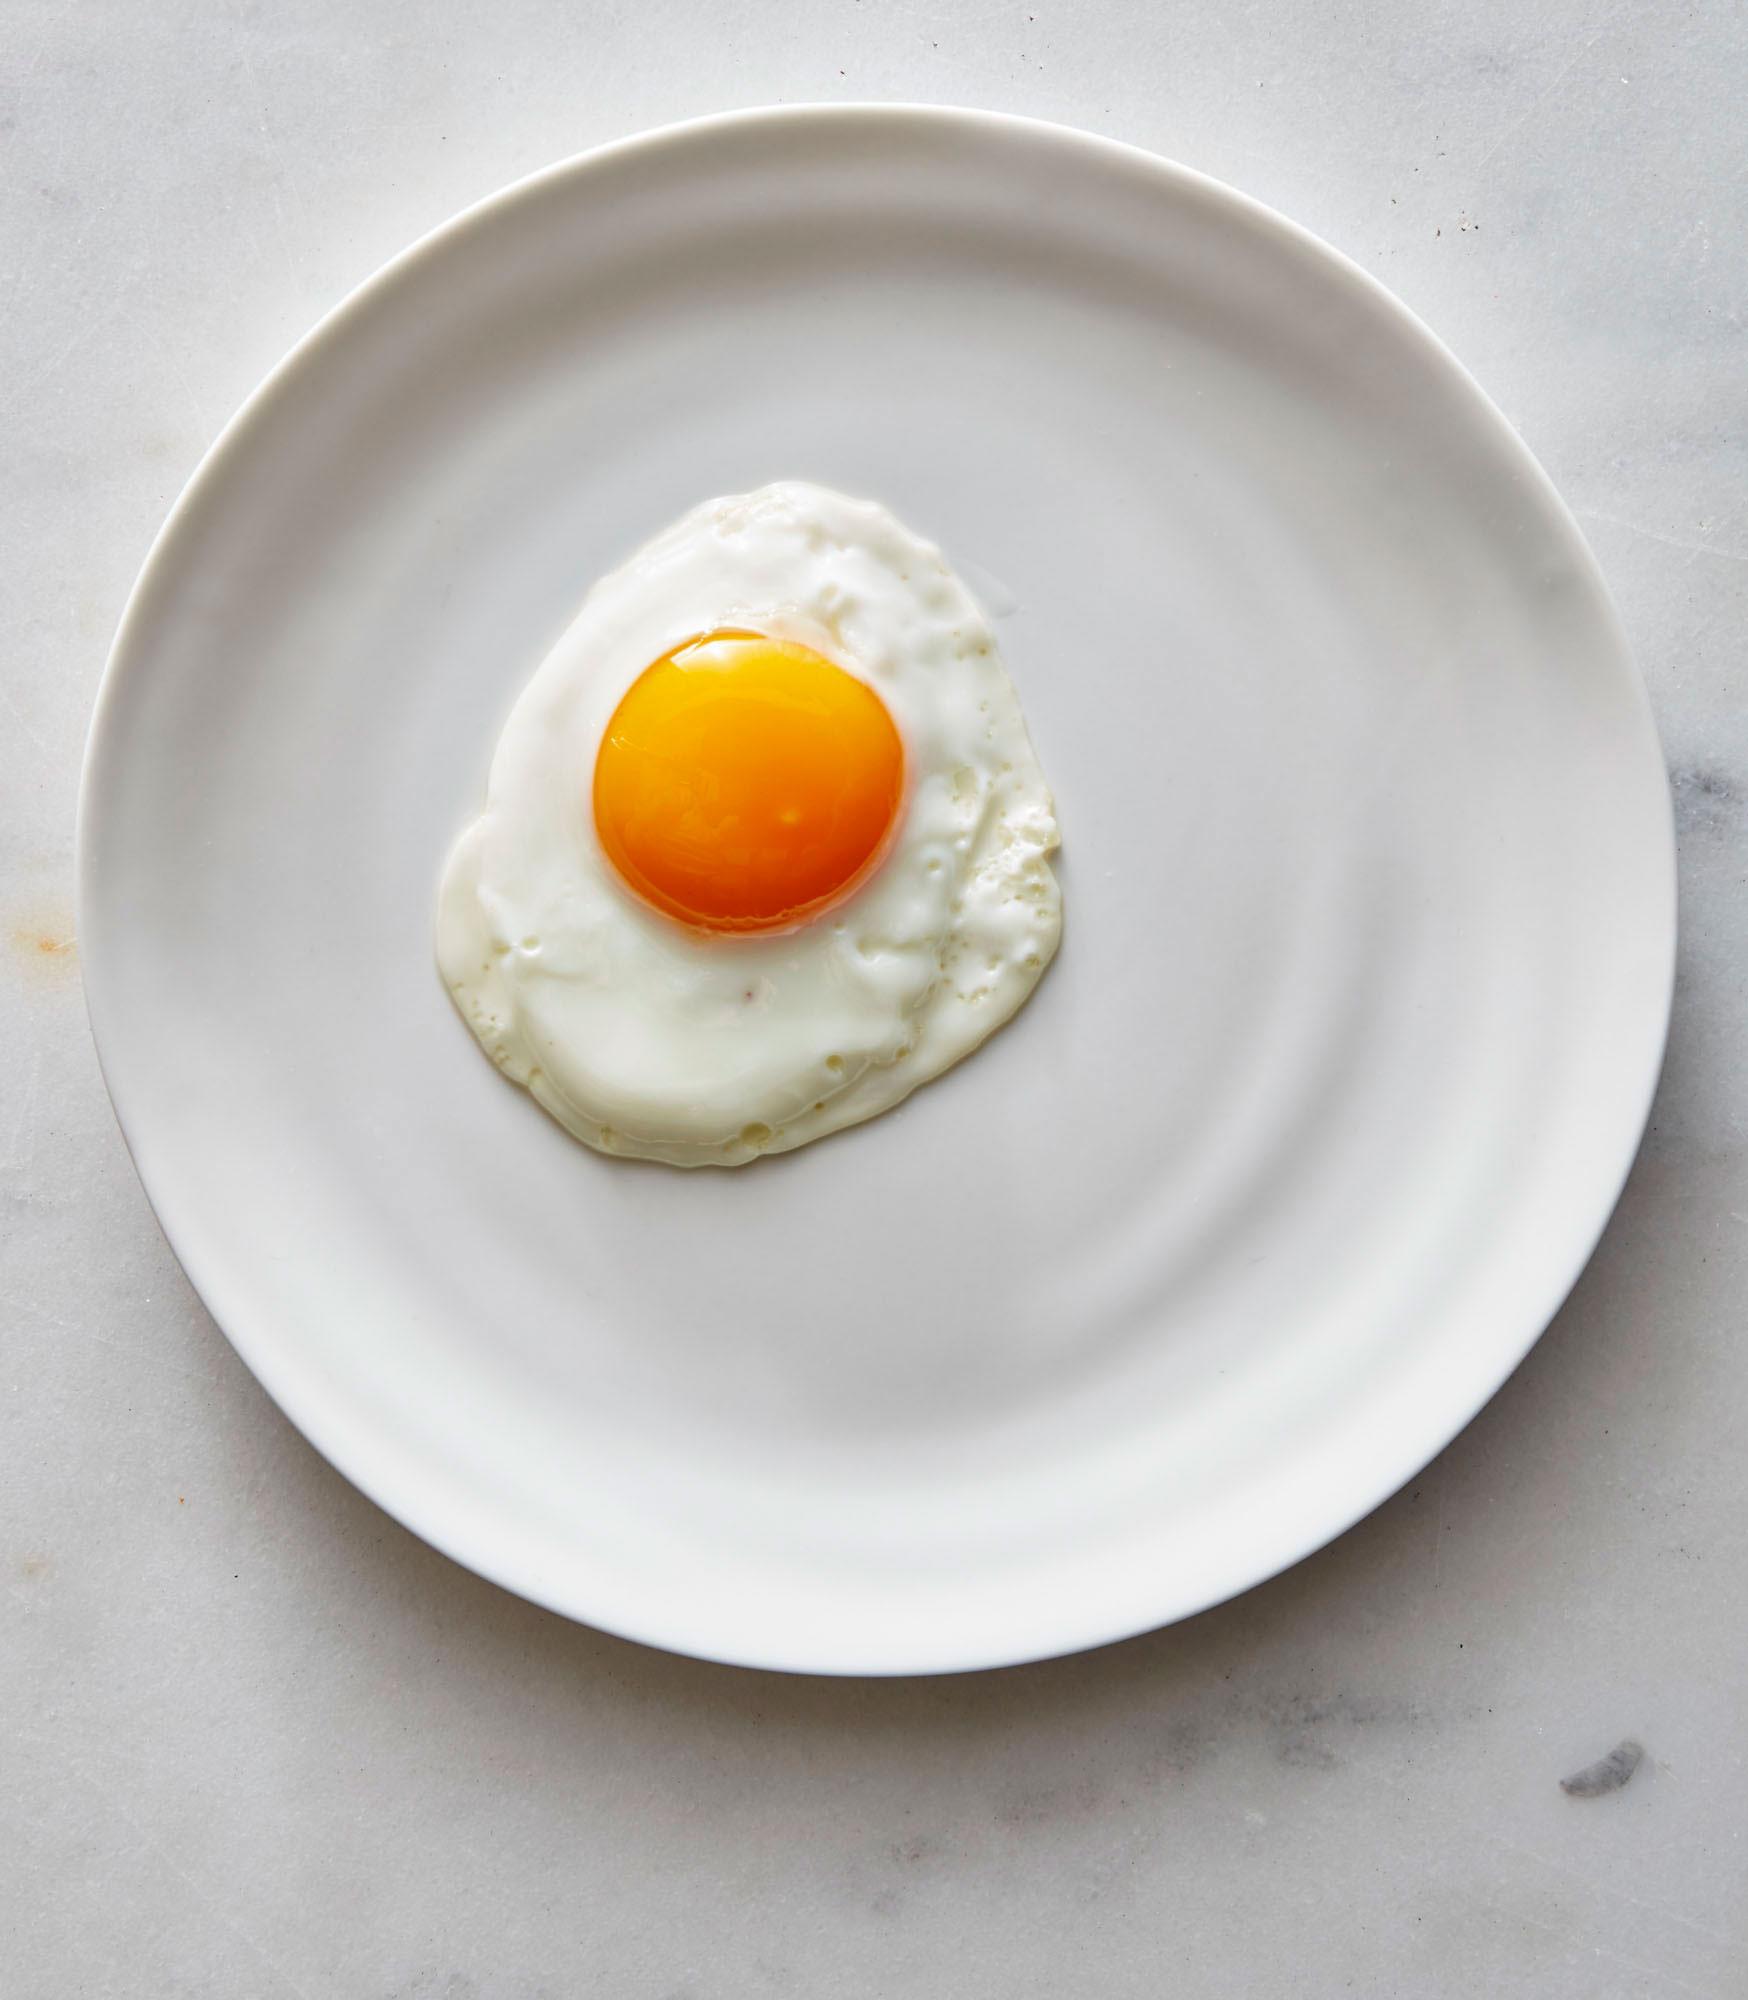 Pristine Sunny-Side Up Eggs image